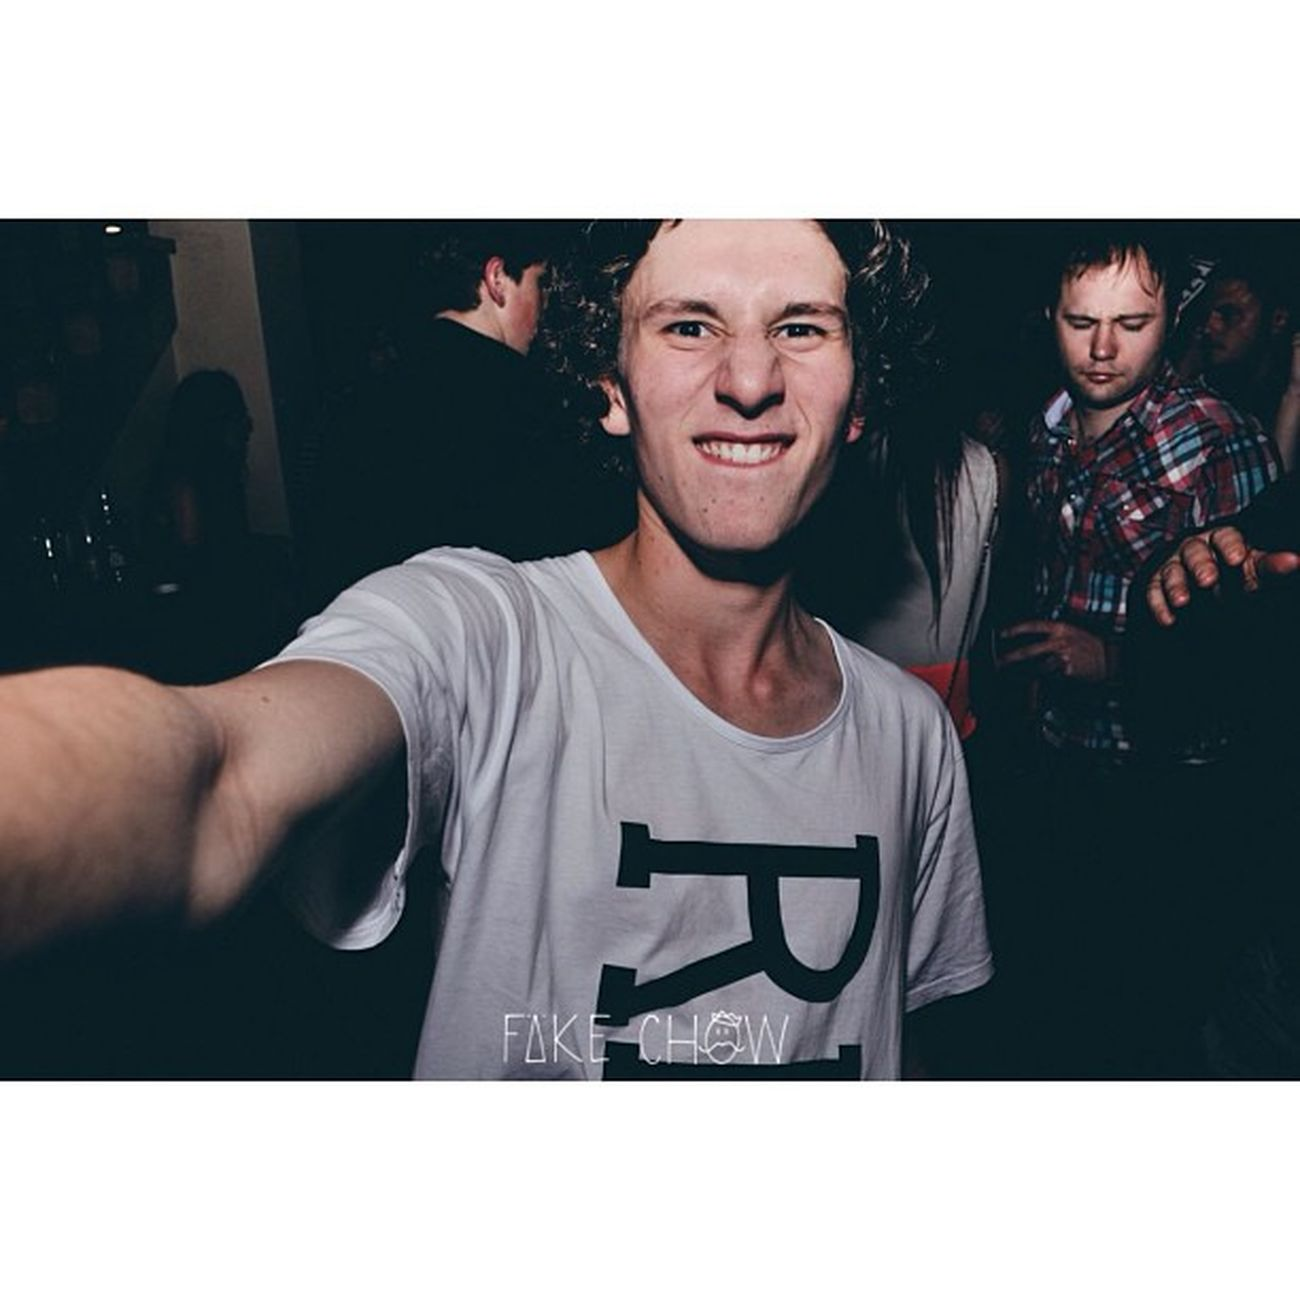 Selfie at chow ??? Fakechow Claptone Ohgod Killingit dprox